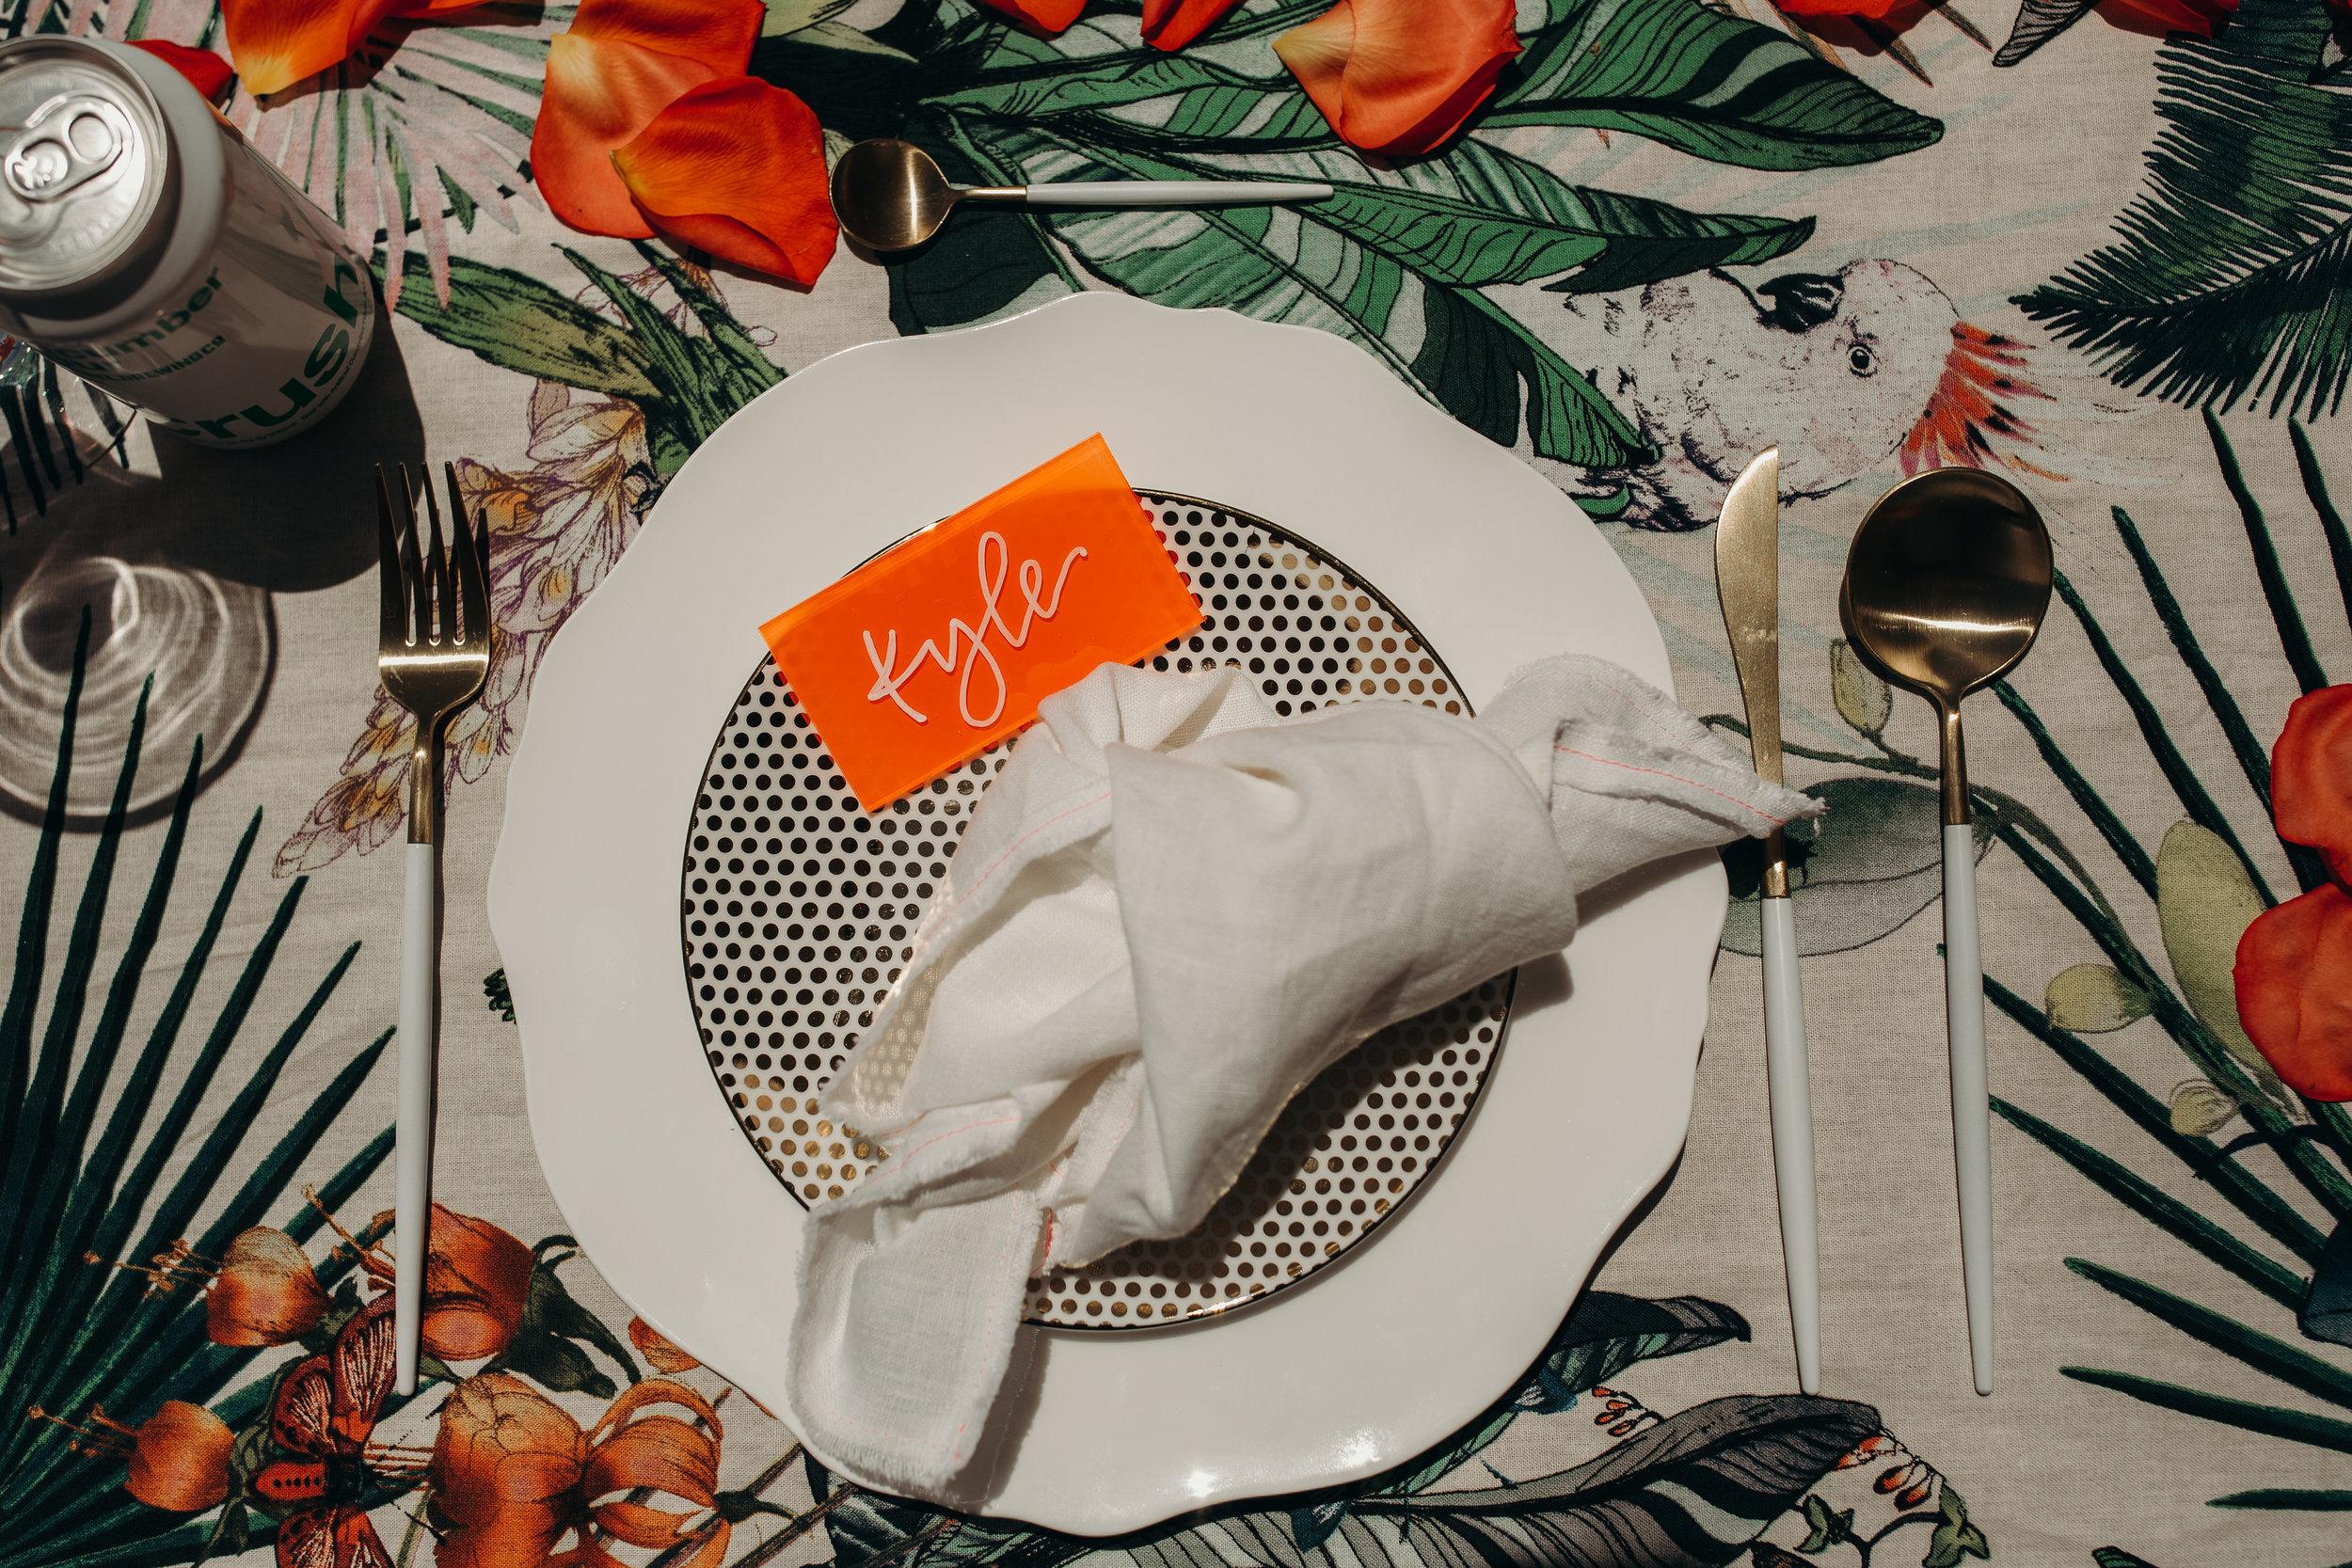 love-fern-design-studio-custom-wedding-invitations-for-the-modern-couple-modern-calligraphy-in-seattle-washington-custom-wedding-stationery-orange-pink-neon-acrylic-invitation-acrylic-place-cards